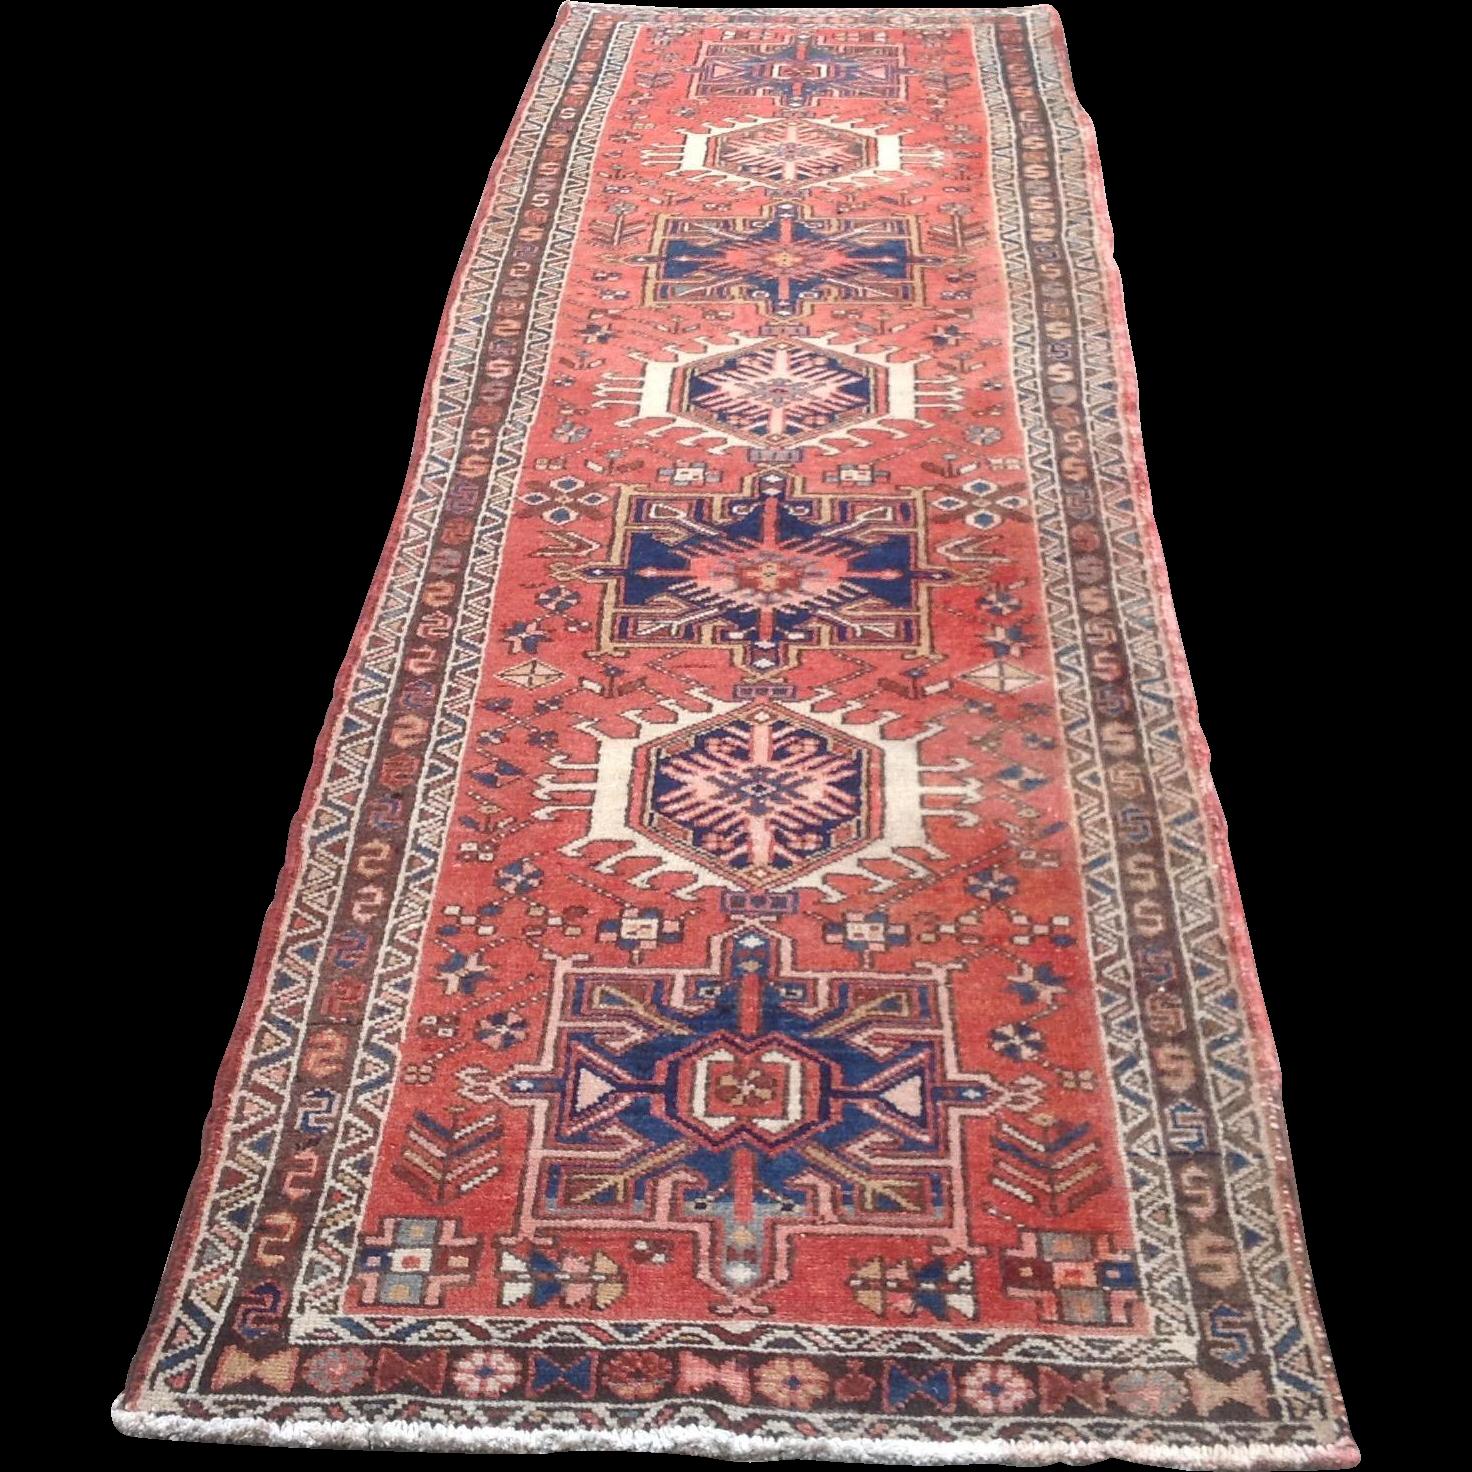 Early 20th c. Persian Karajeh Rug